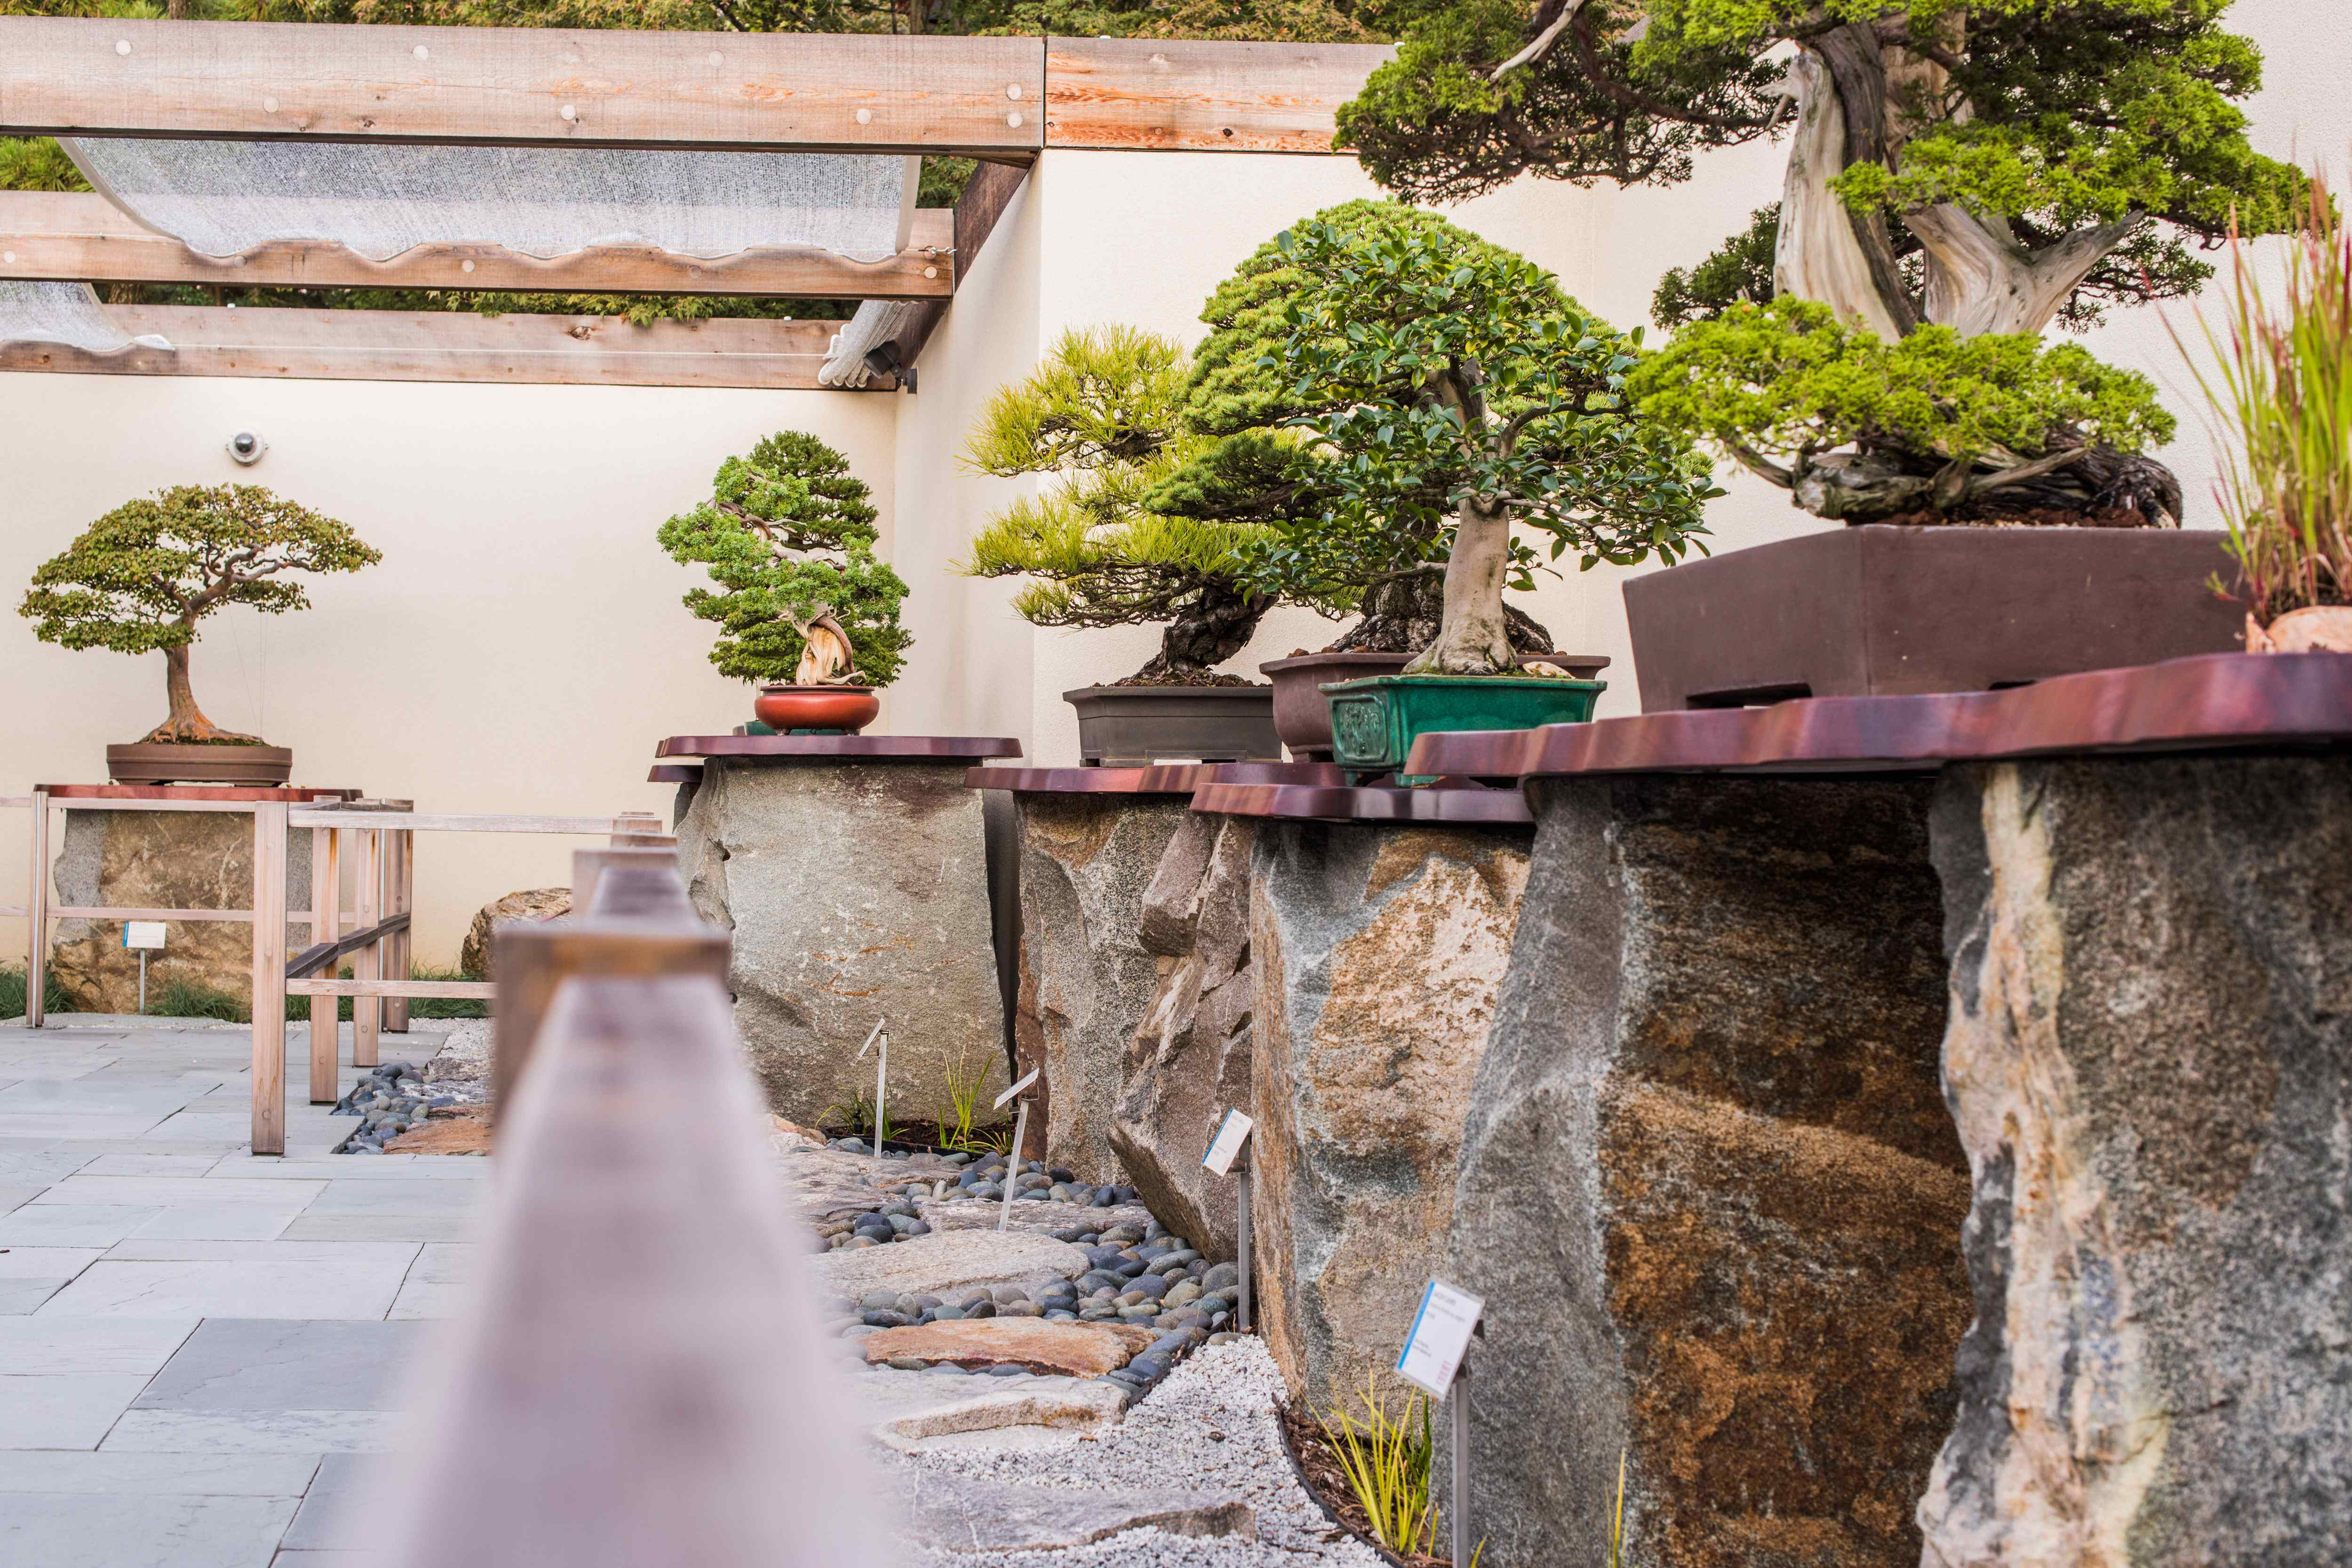 Japanese Pavilion at the National Bonsai & Penjing Museum